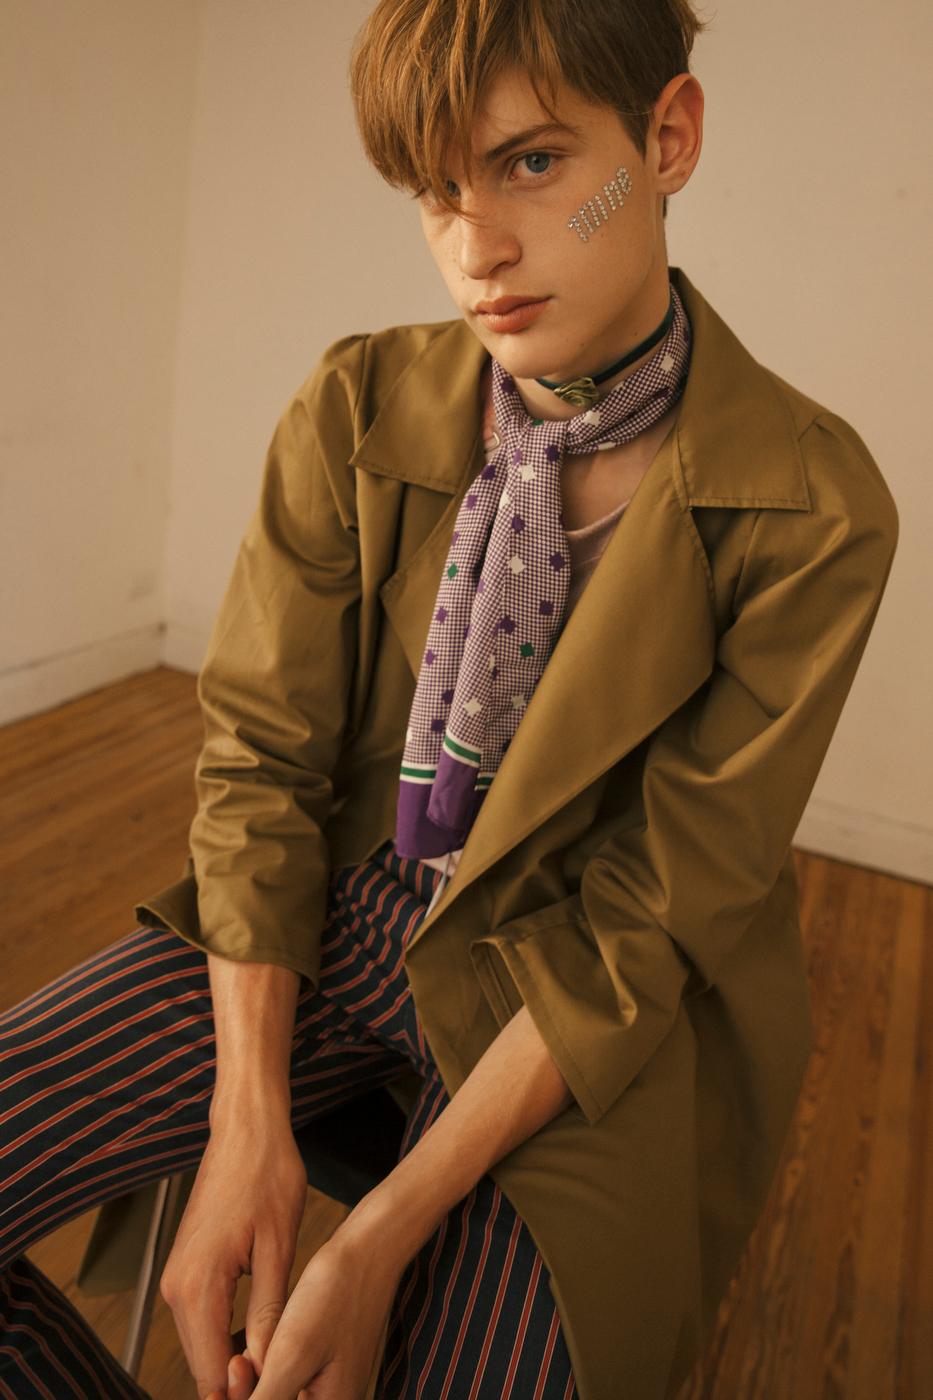 NEW FACES: Martin by Noelia Carballo NEW FACES: Martin by Noelia Carballo Vanity Teen 虚荣青年 Menswear & new faces magazine